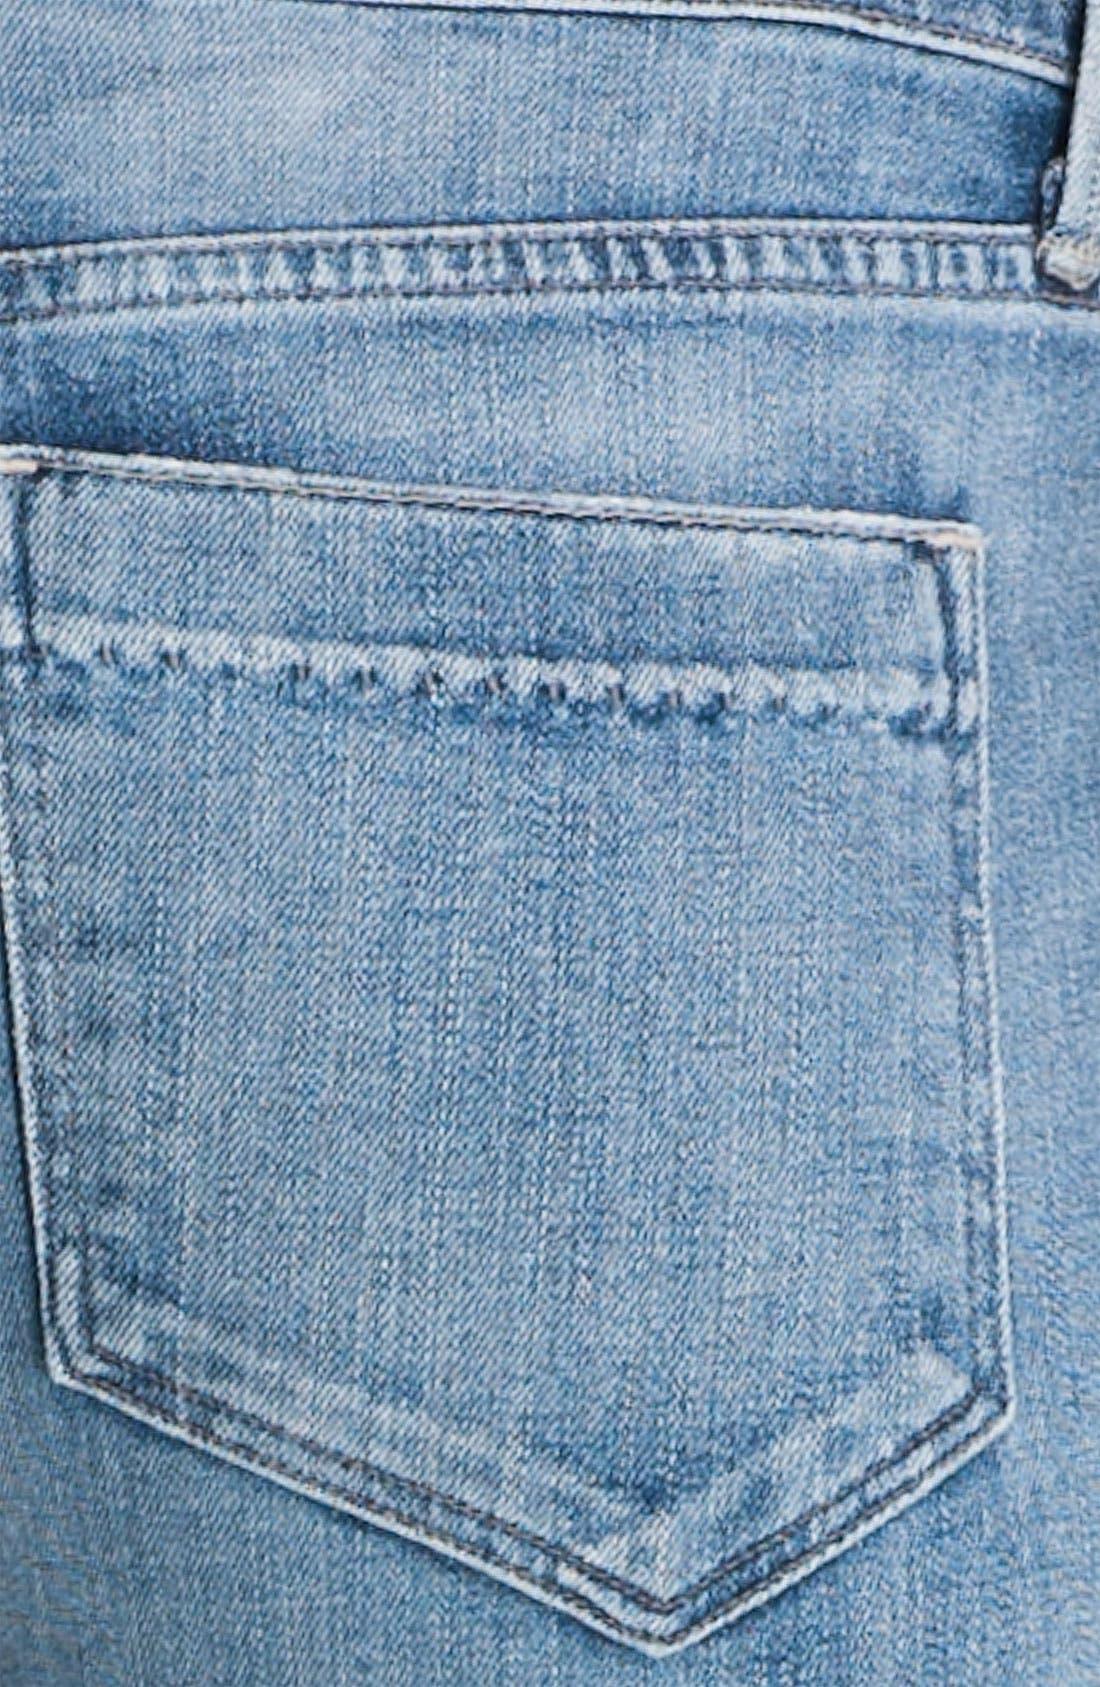 Alternate Image 3  - Citizens of Humanity 'Mandy' Slim Straight Leg Jeans (Crystal)